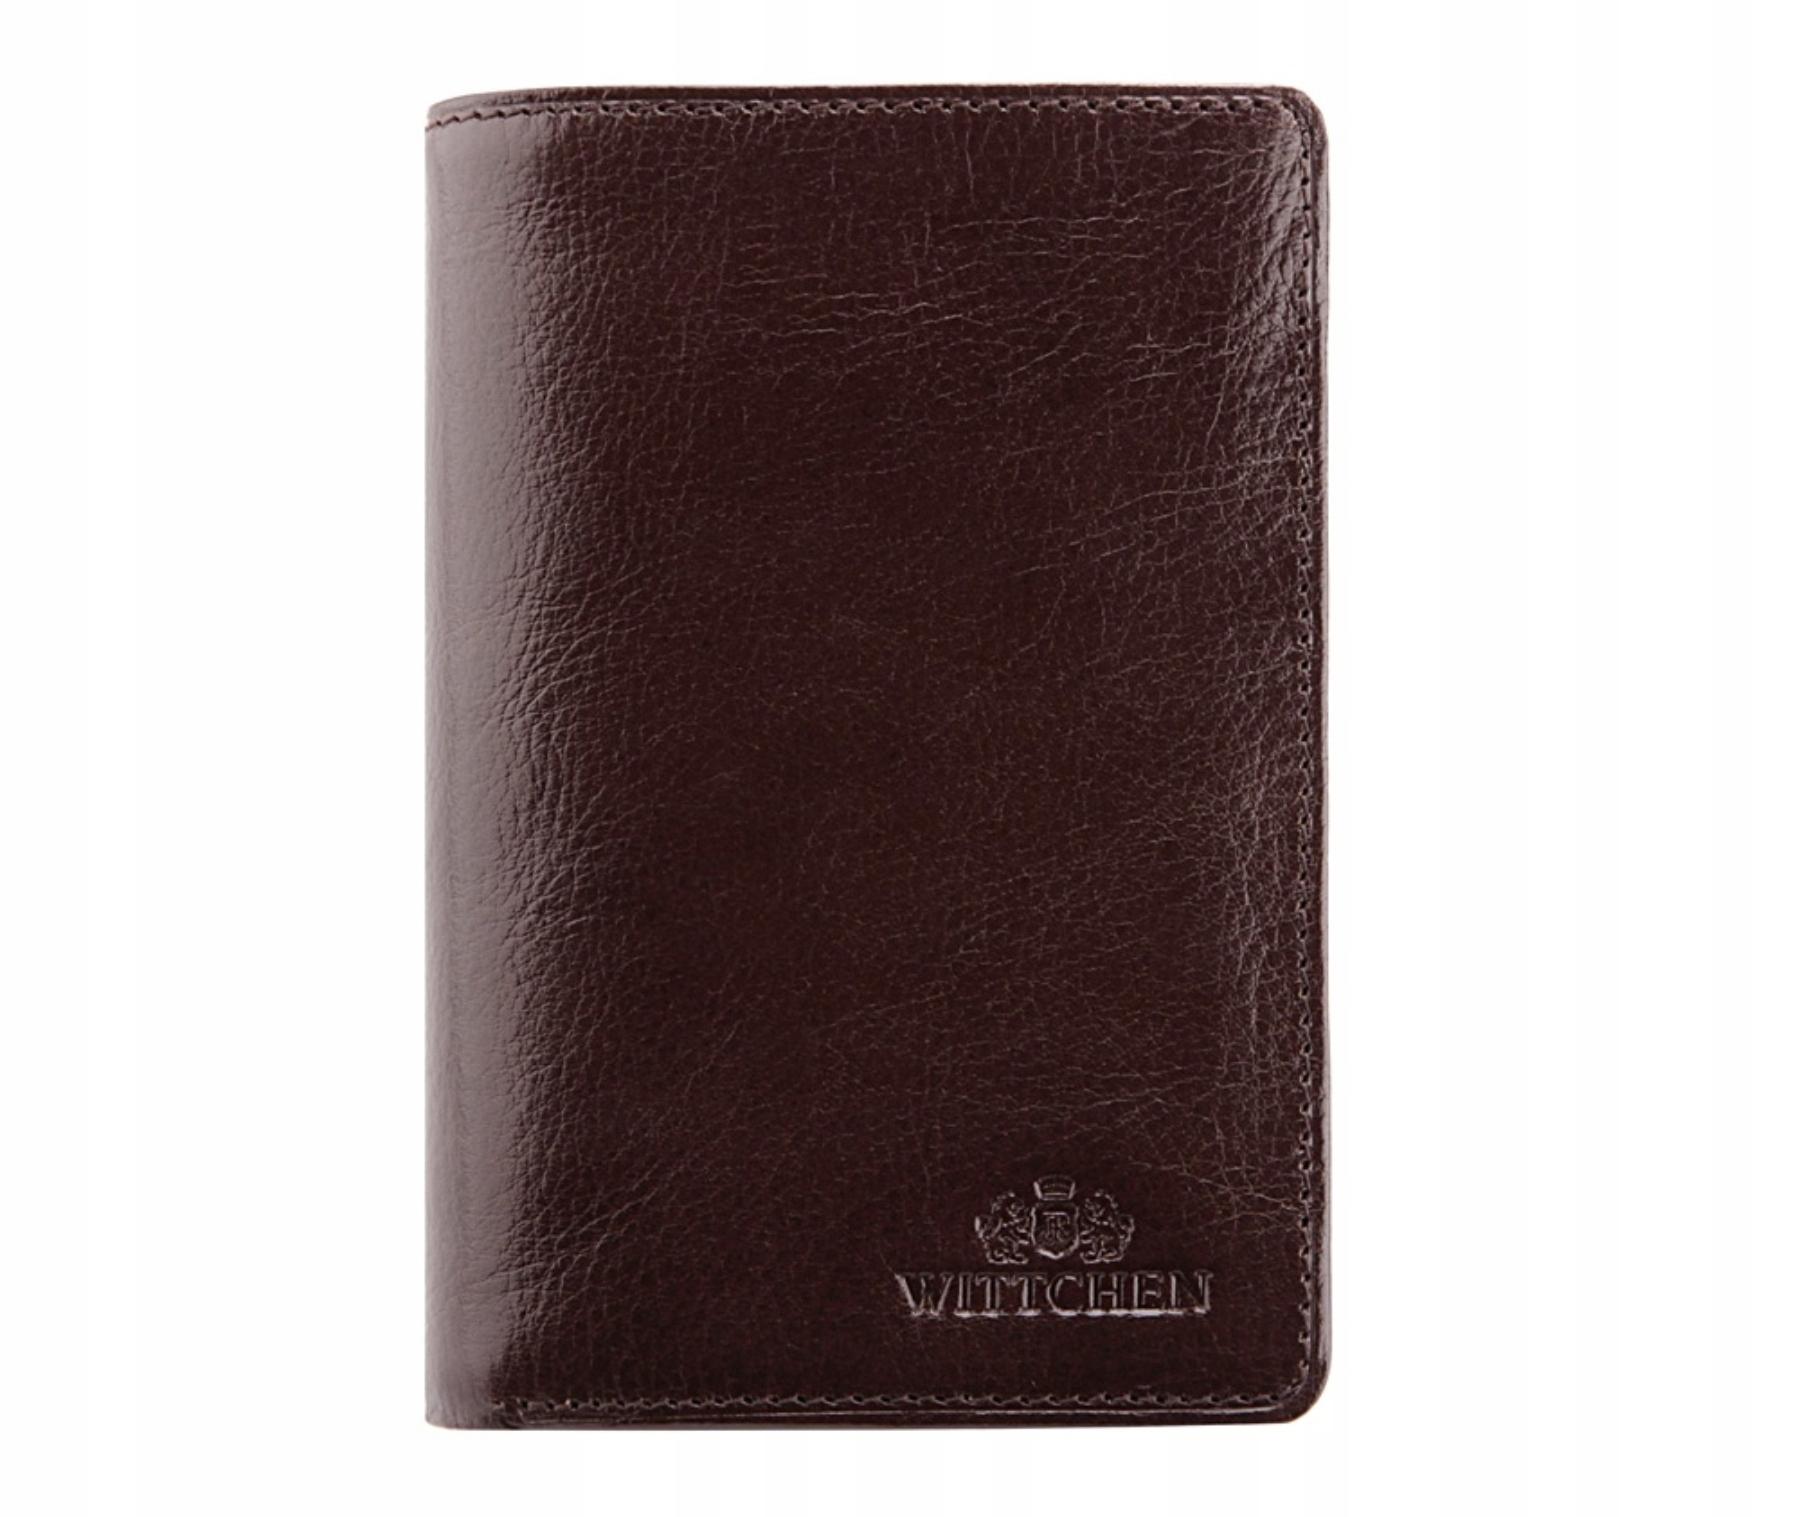 f19a55c040e3d WITTCHEN portfel męski SKÓRA 21-1-008-4 GRAWER RR - 7675454648 ...